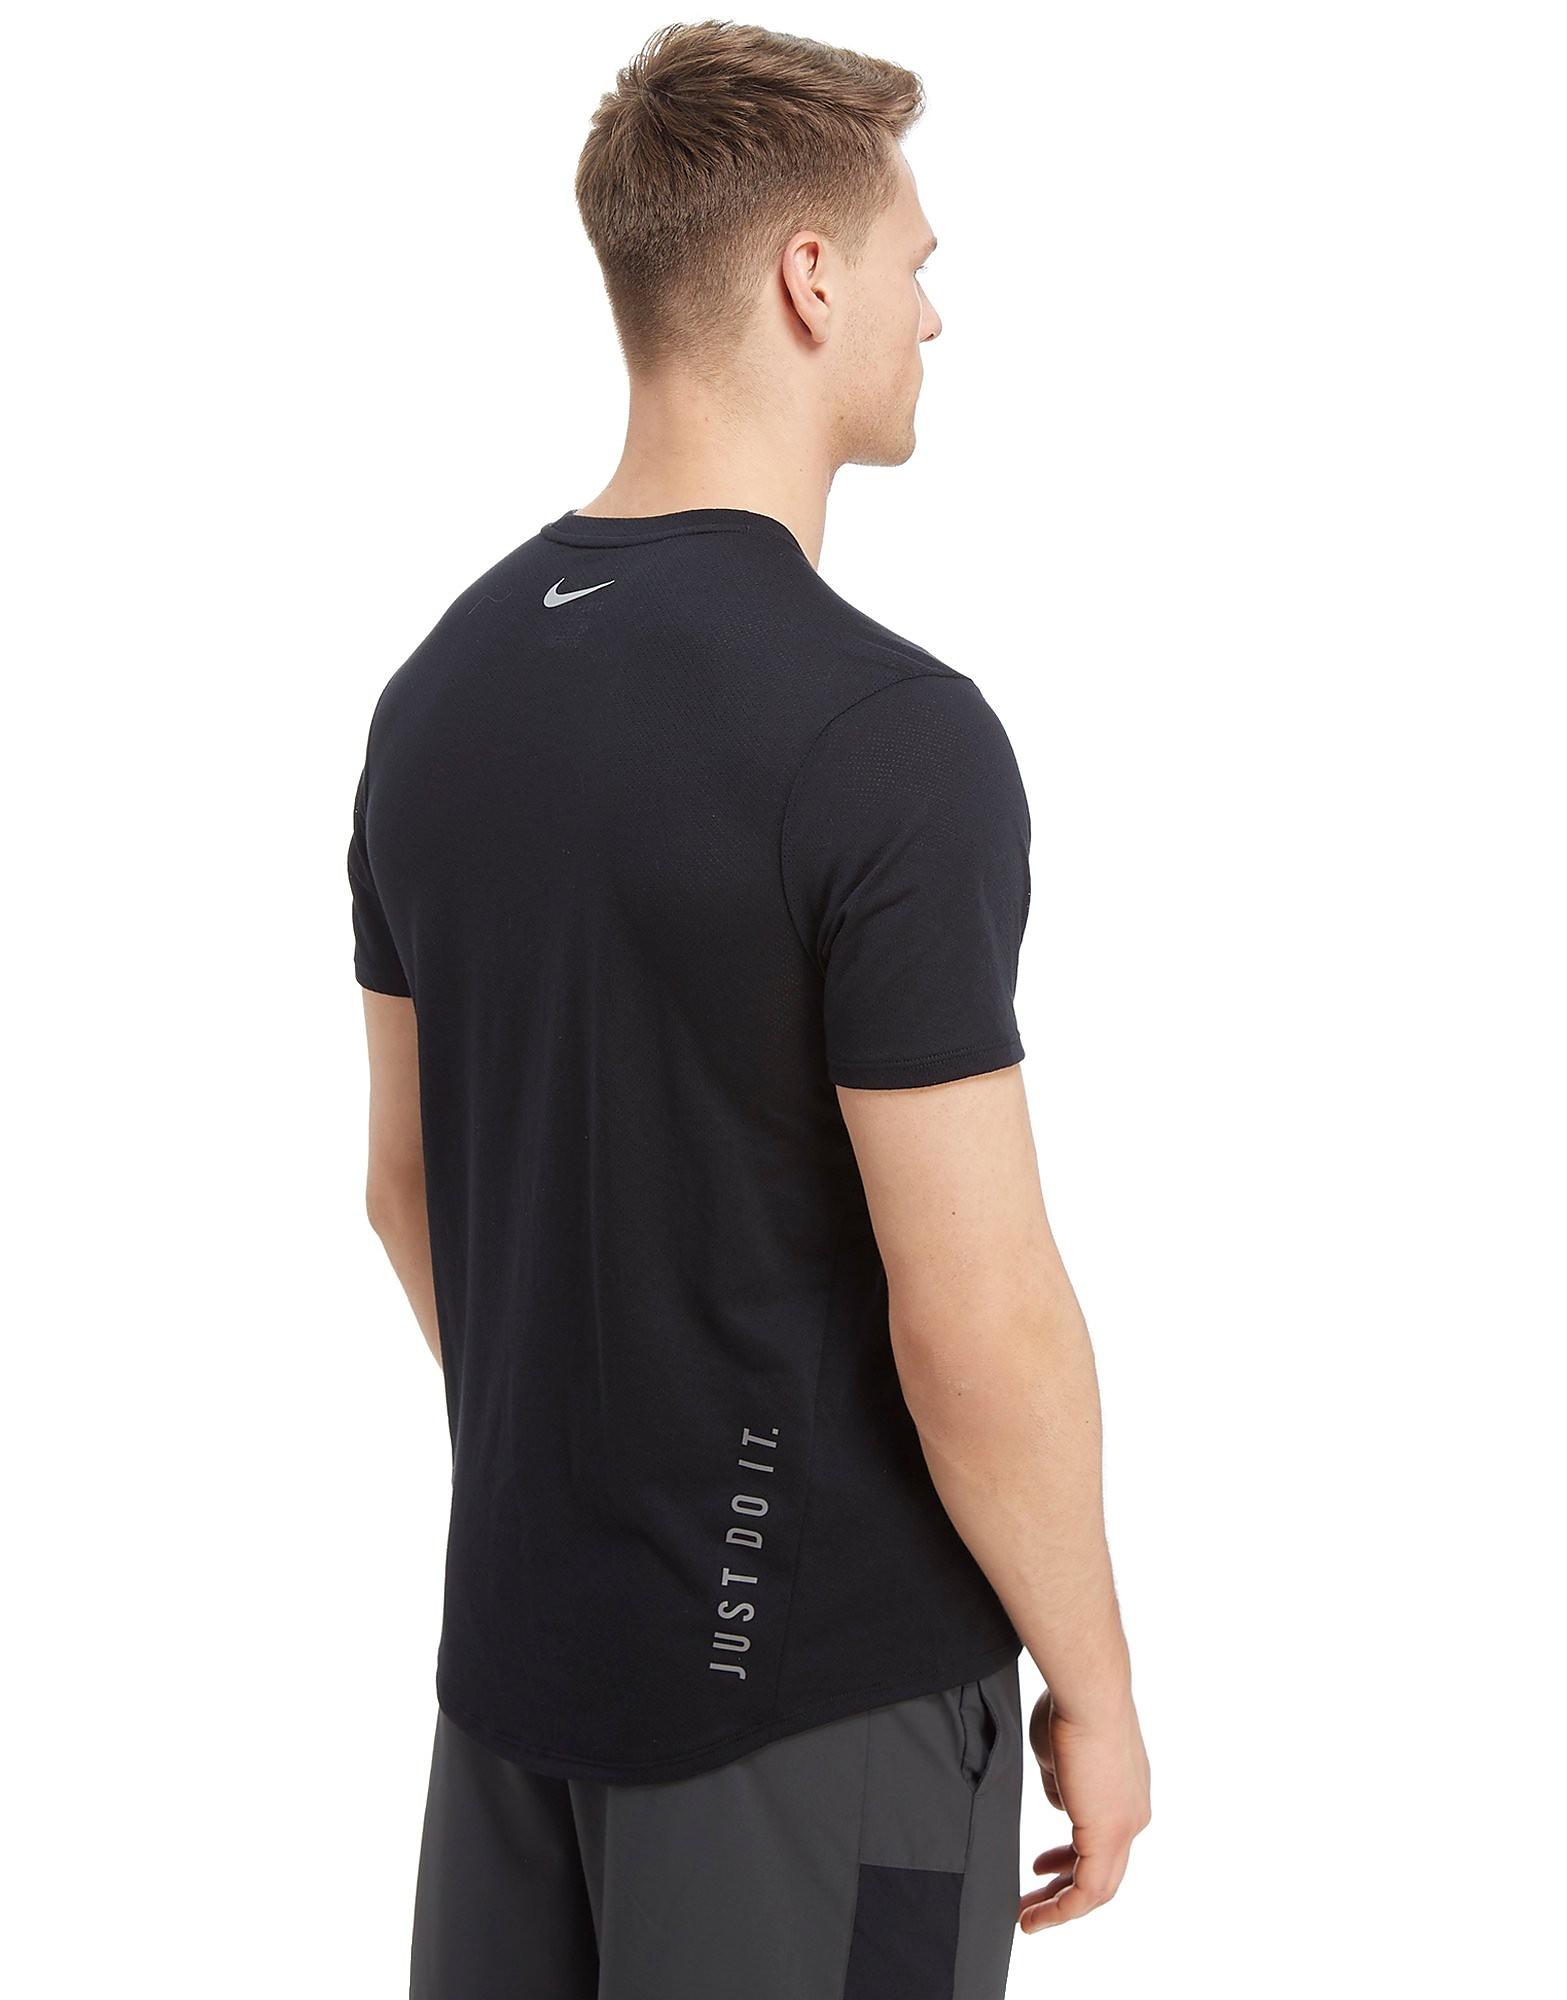 Nike T-shirt Rise Homme